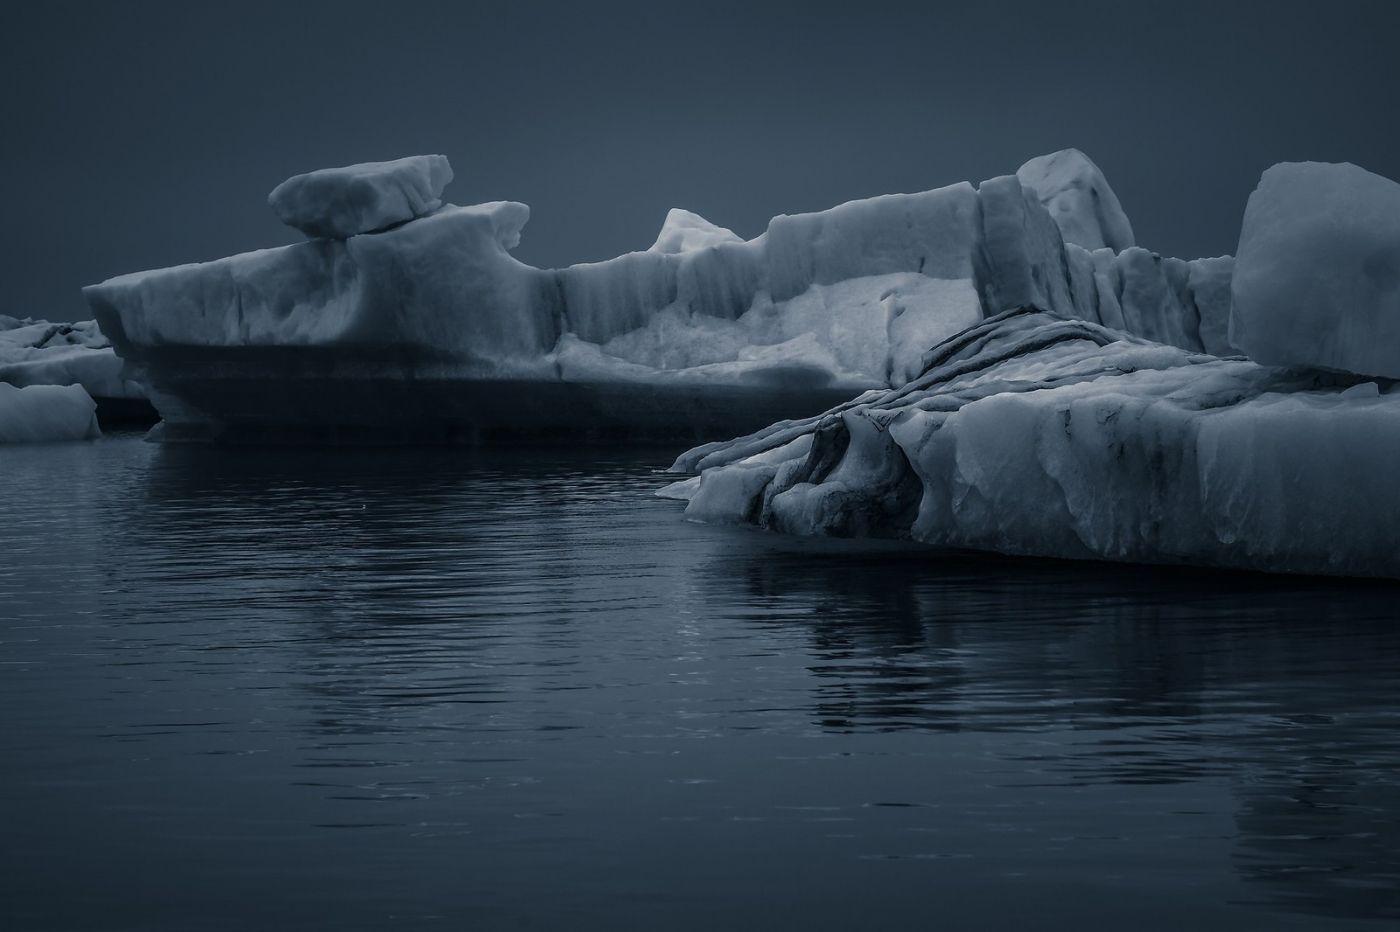 冰岛冰川泻湖(Glacier Lagoon),流动的冰川_图1-33